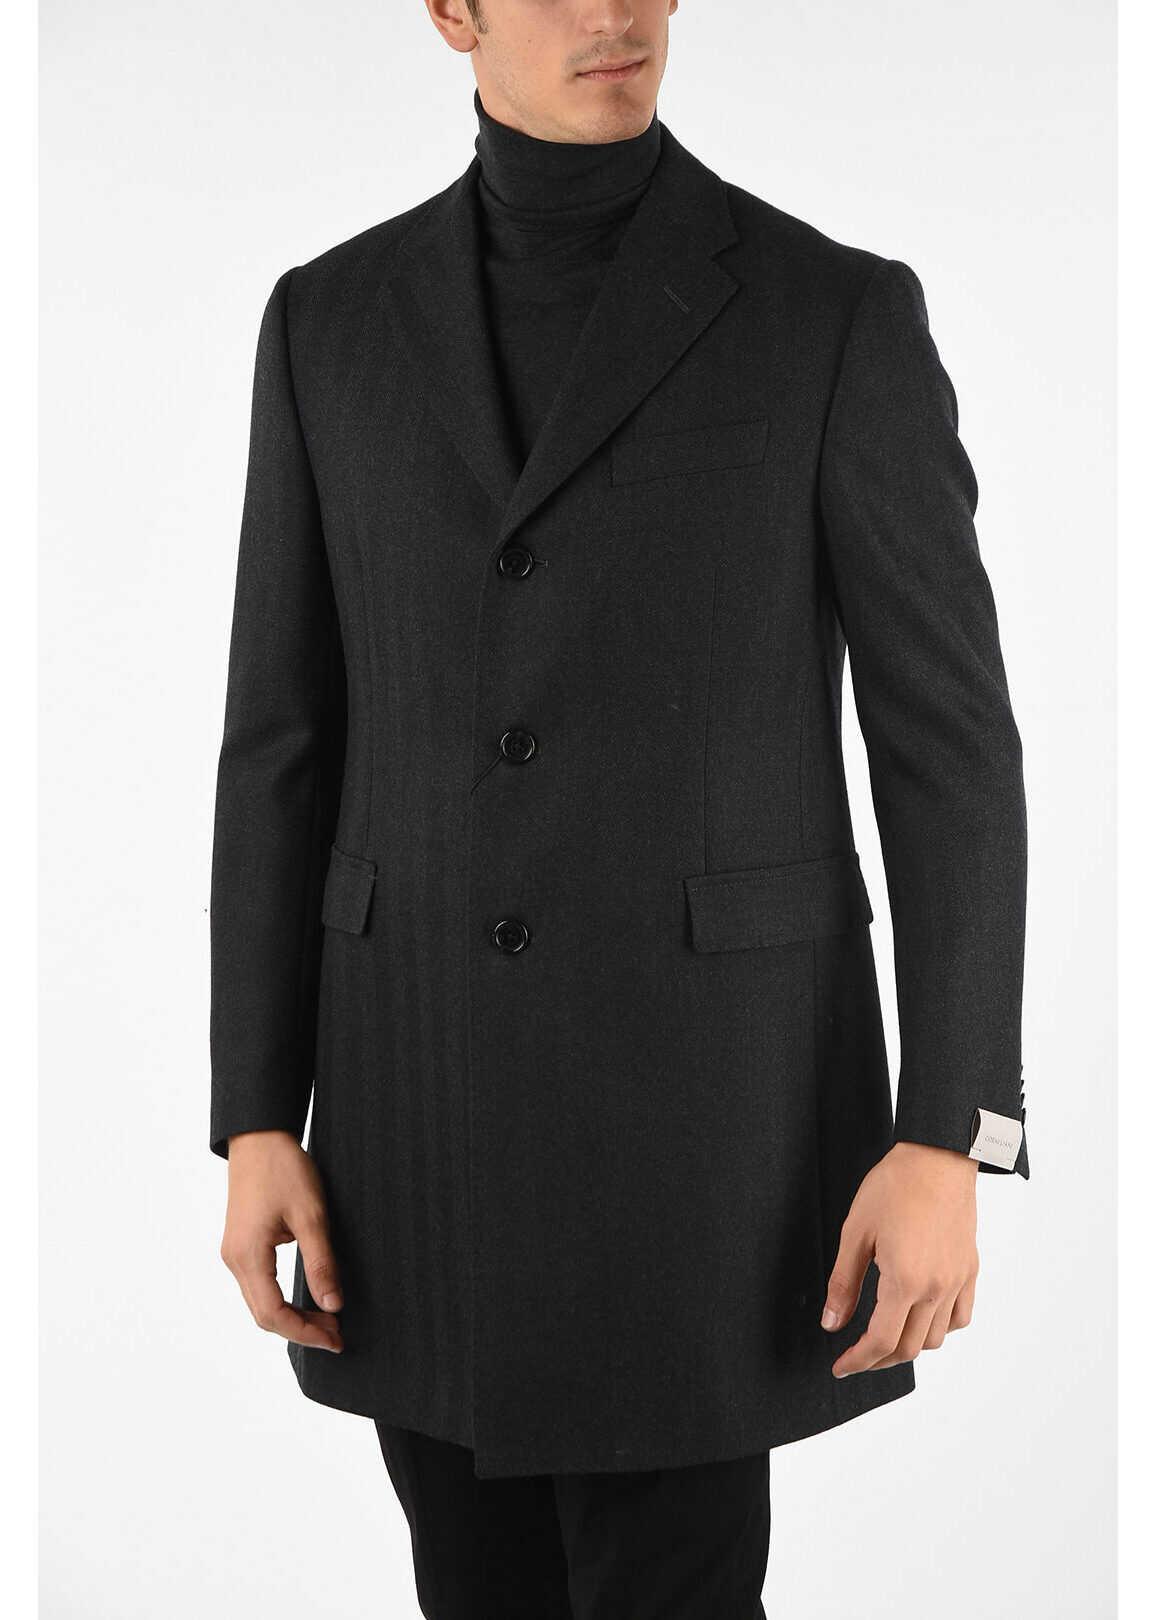 CORNELIANI plain herringbone 3-button coat GRAY imagine